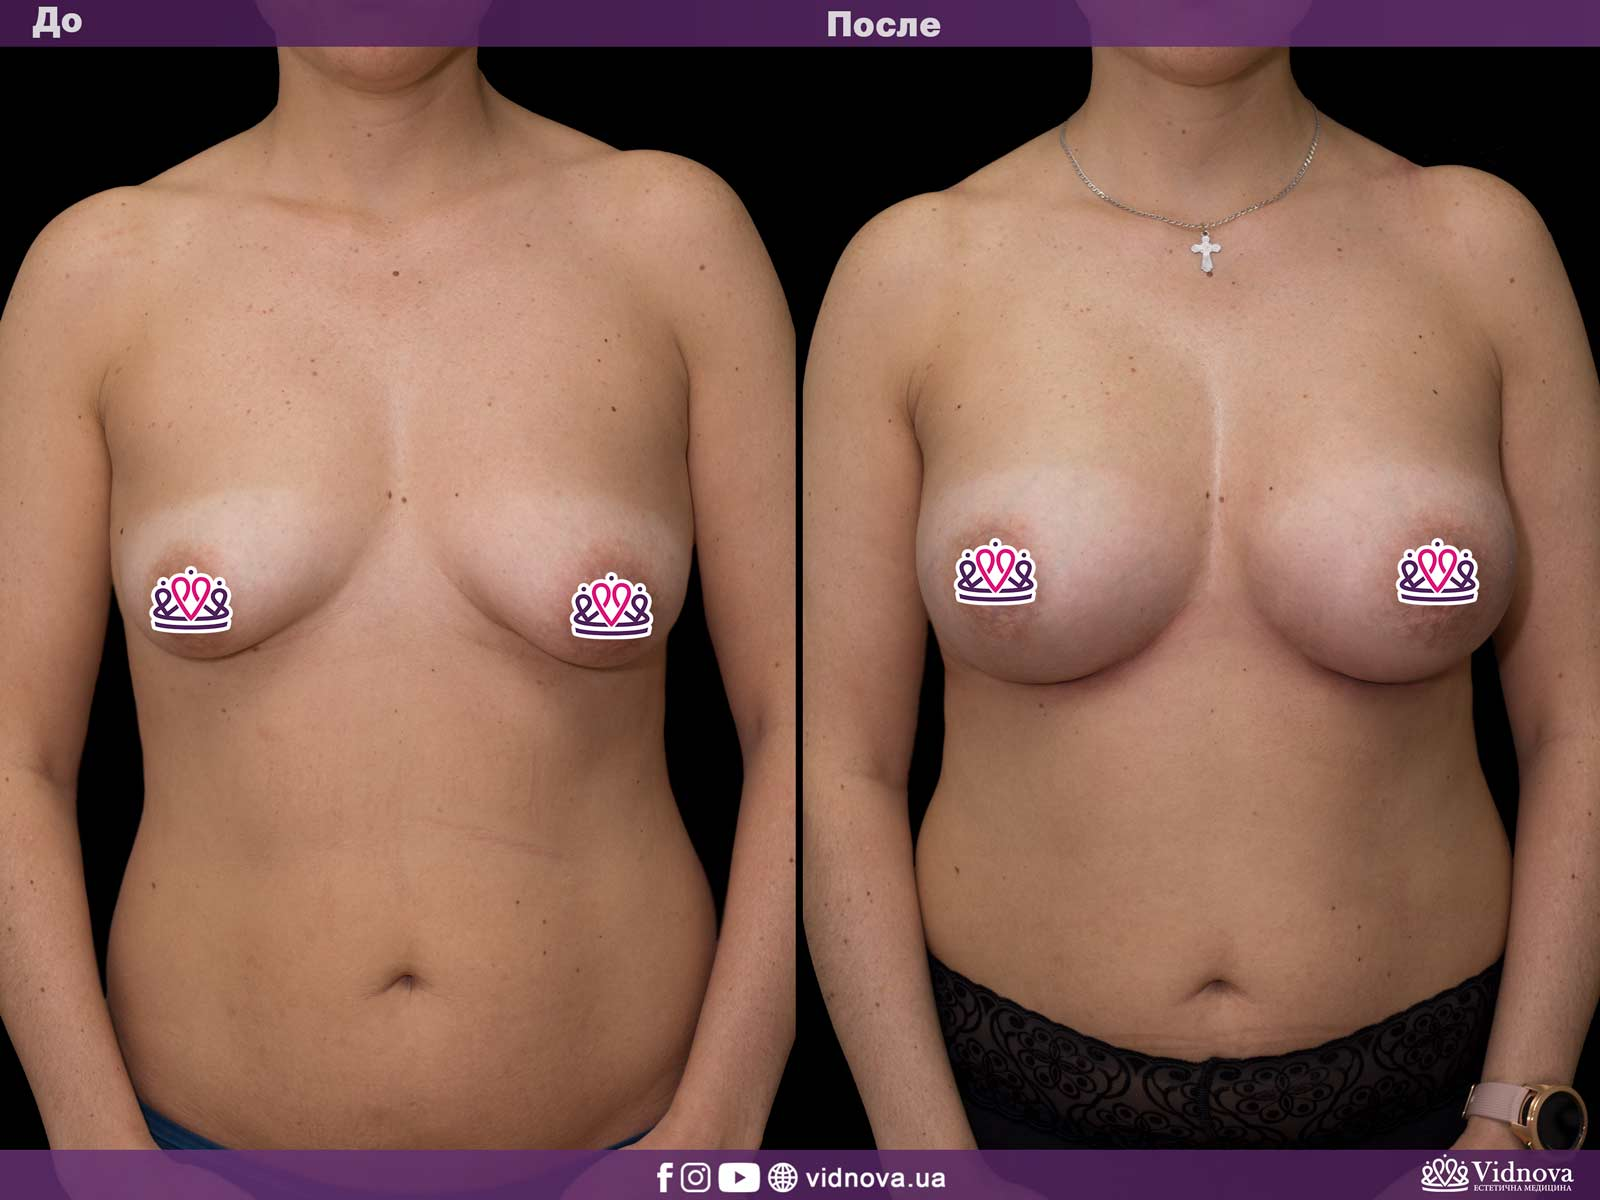 Увеличение груди: Фото ДО и ПОСЛЕ - Пример №31-1 - Клиника Vidnova